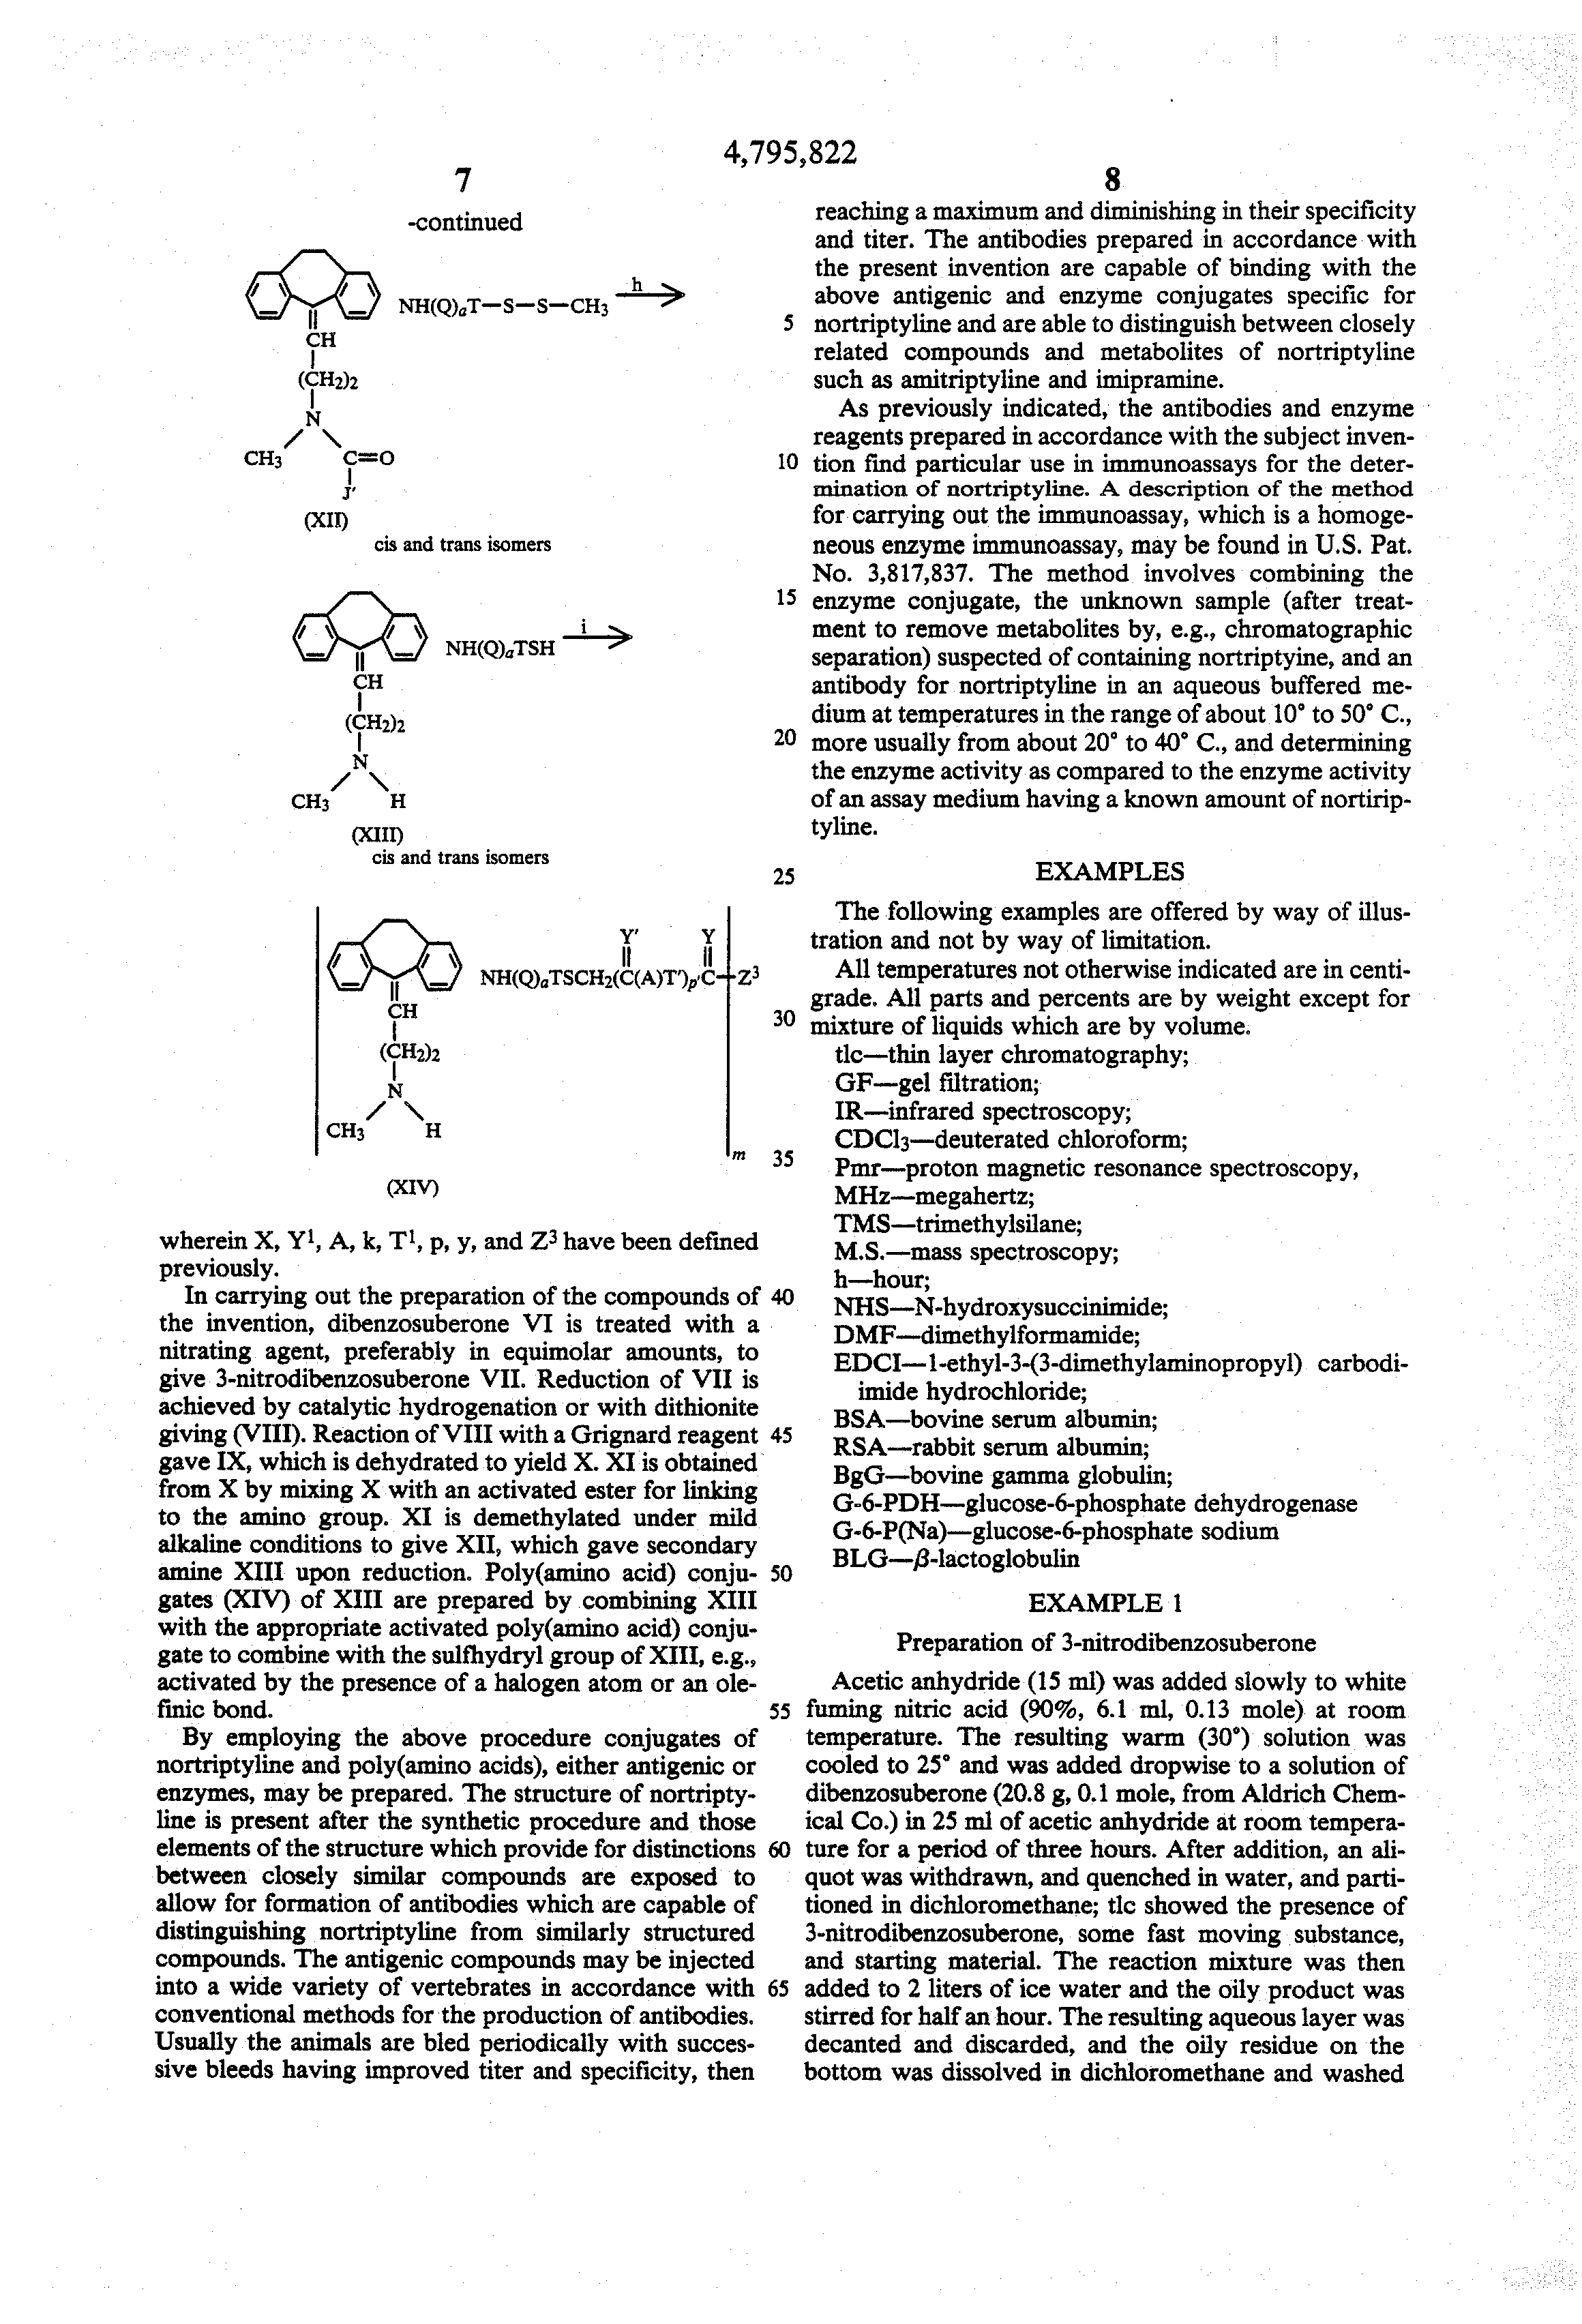 paxil 20 mg film tablet